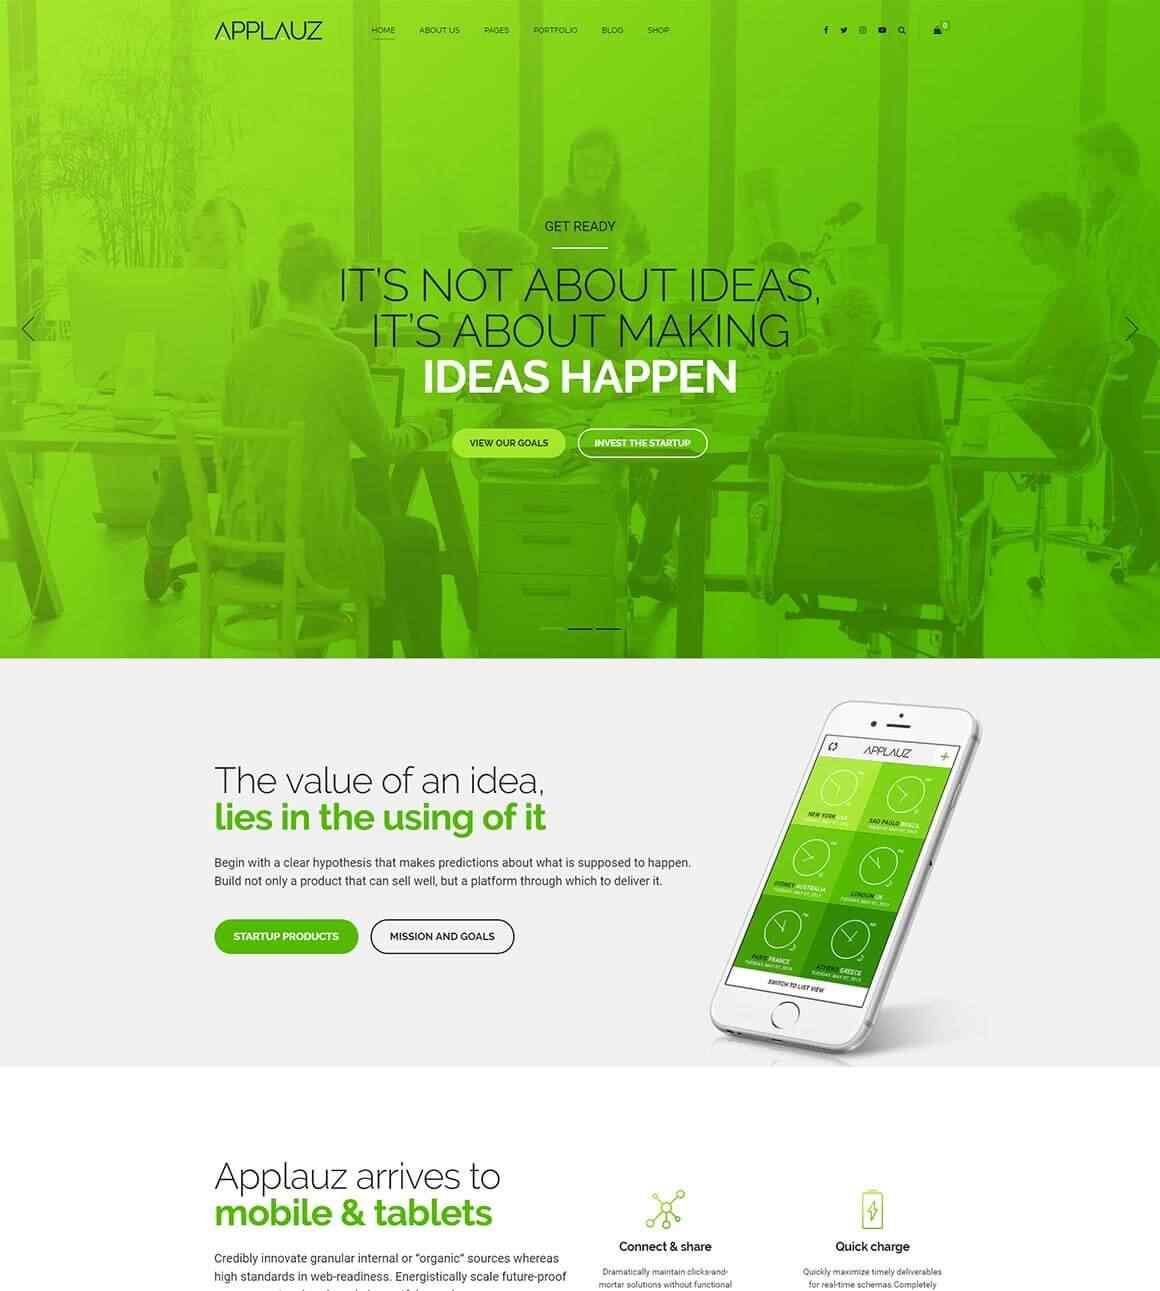 https://www.radiospectrum.es/wp-content/uploads/2017/11/Screenshot-Startup.jpg